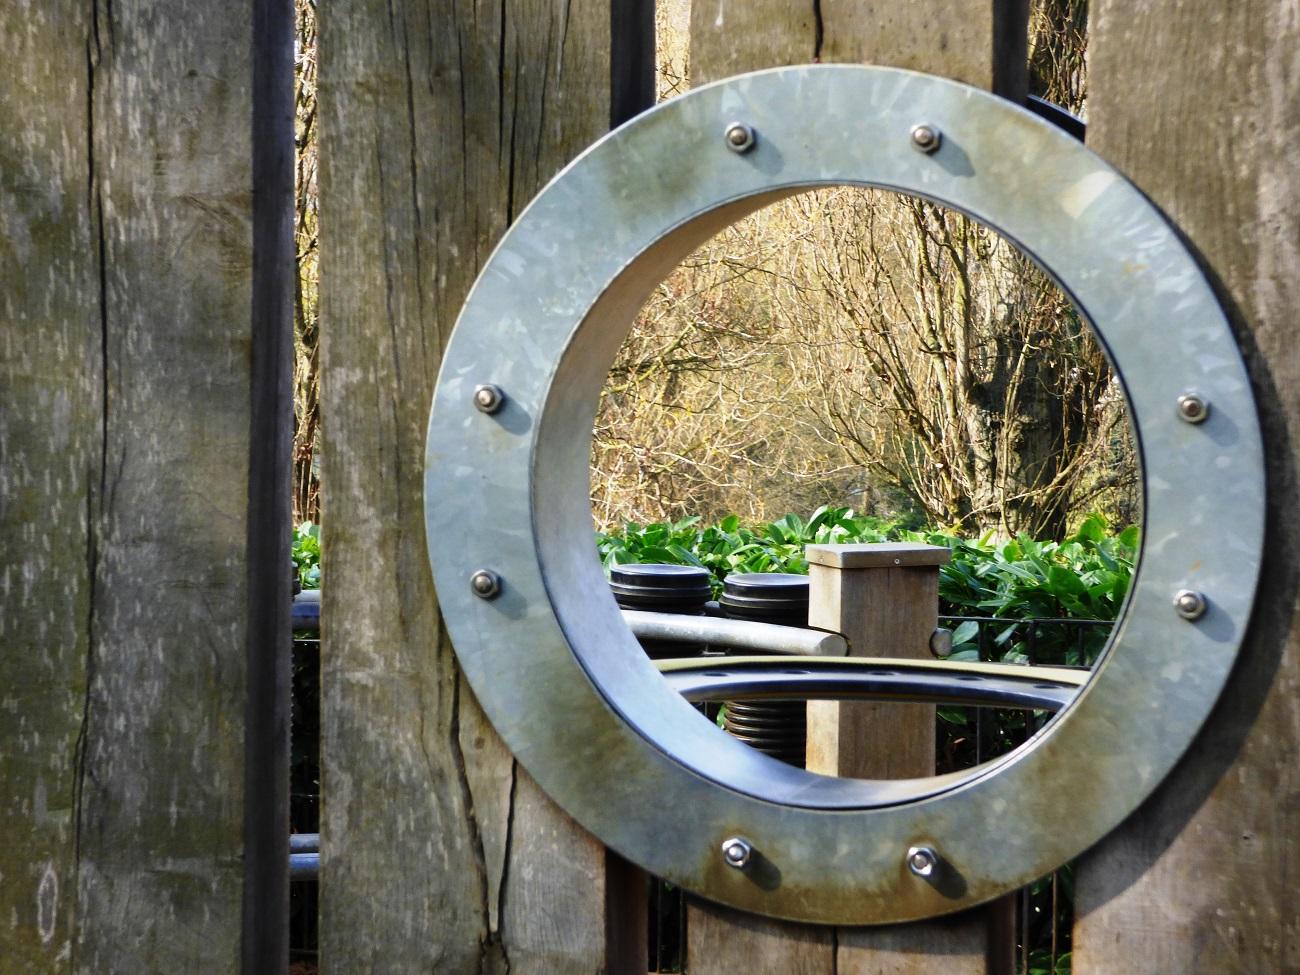 20170327_Lewisham_Horniman-Museum-Gardens_Horniman-Museum-Gardens